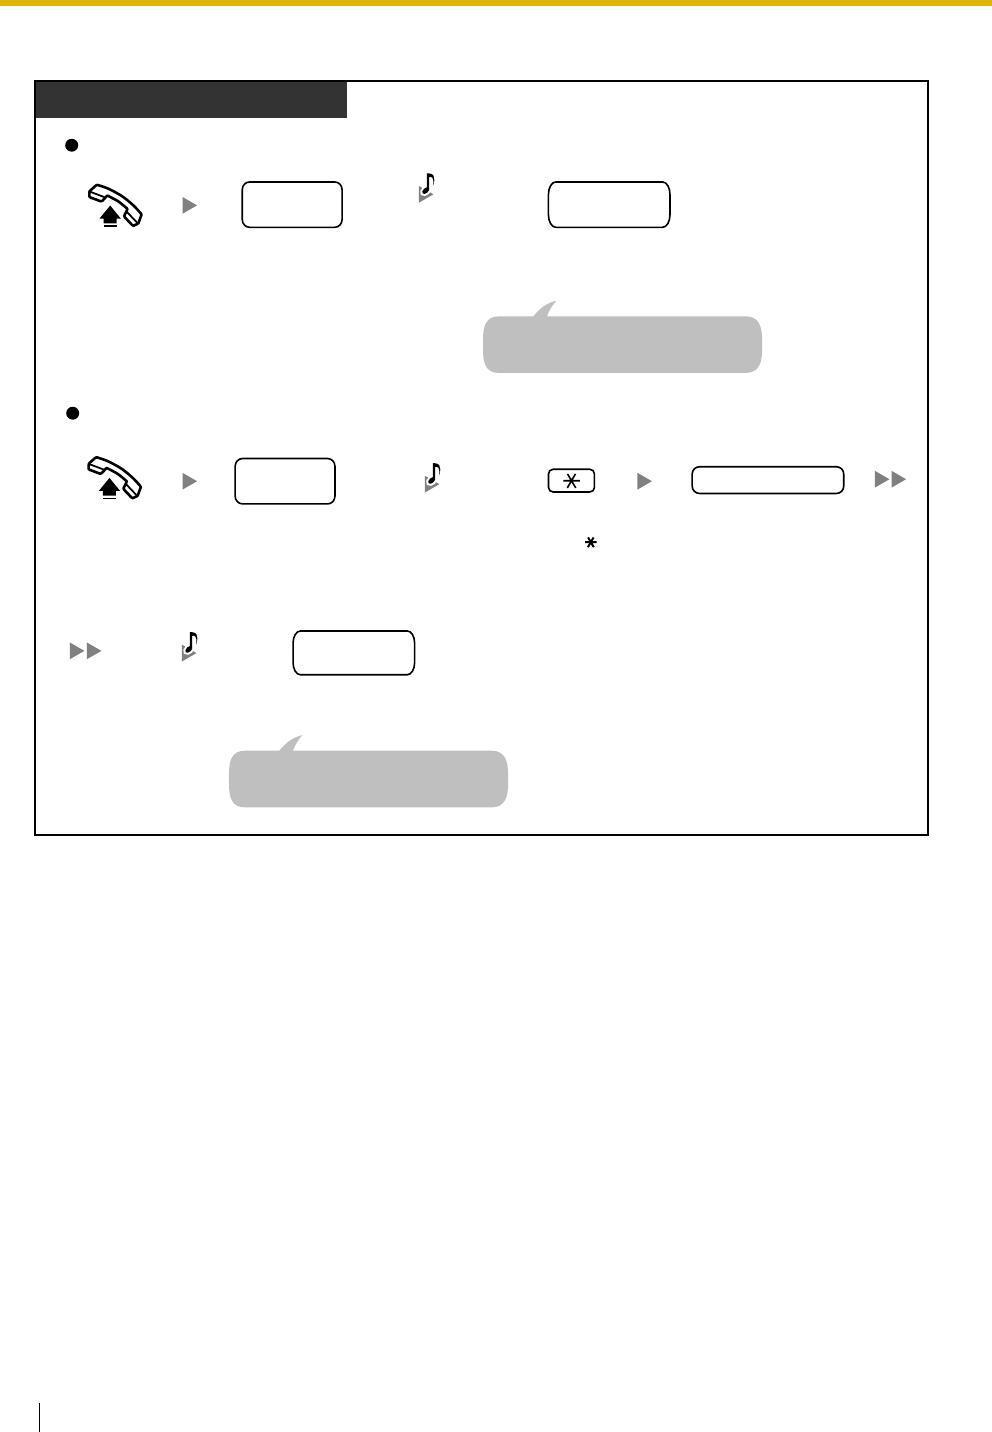 panasonic kx tes824 kx tem824 user manual download page 42 rh rsmanuals com panasonic pabx kx-tem824 user manual Panasonic PBX 824